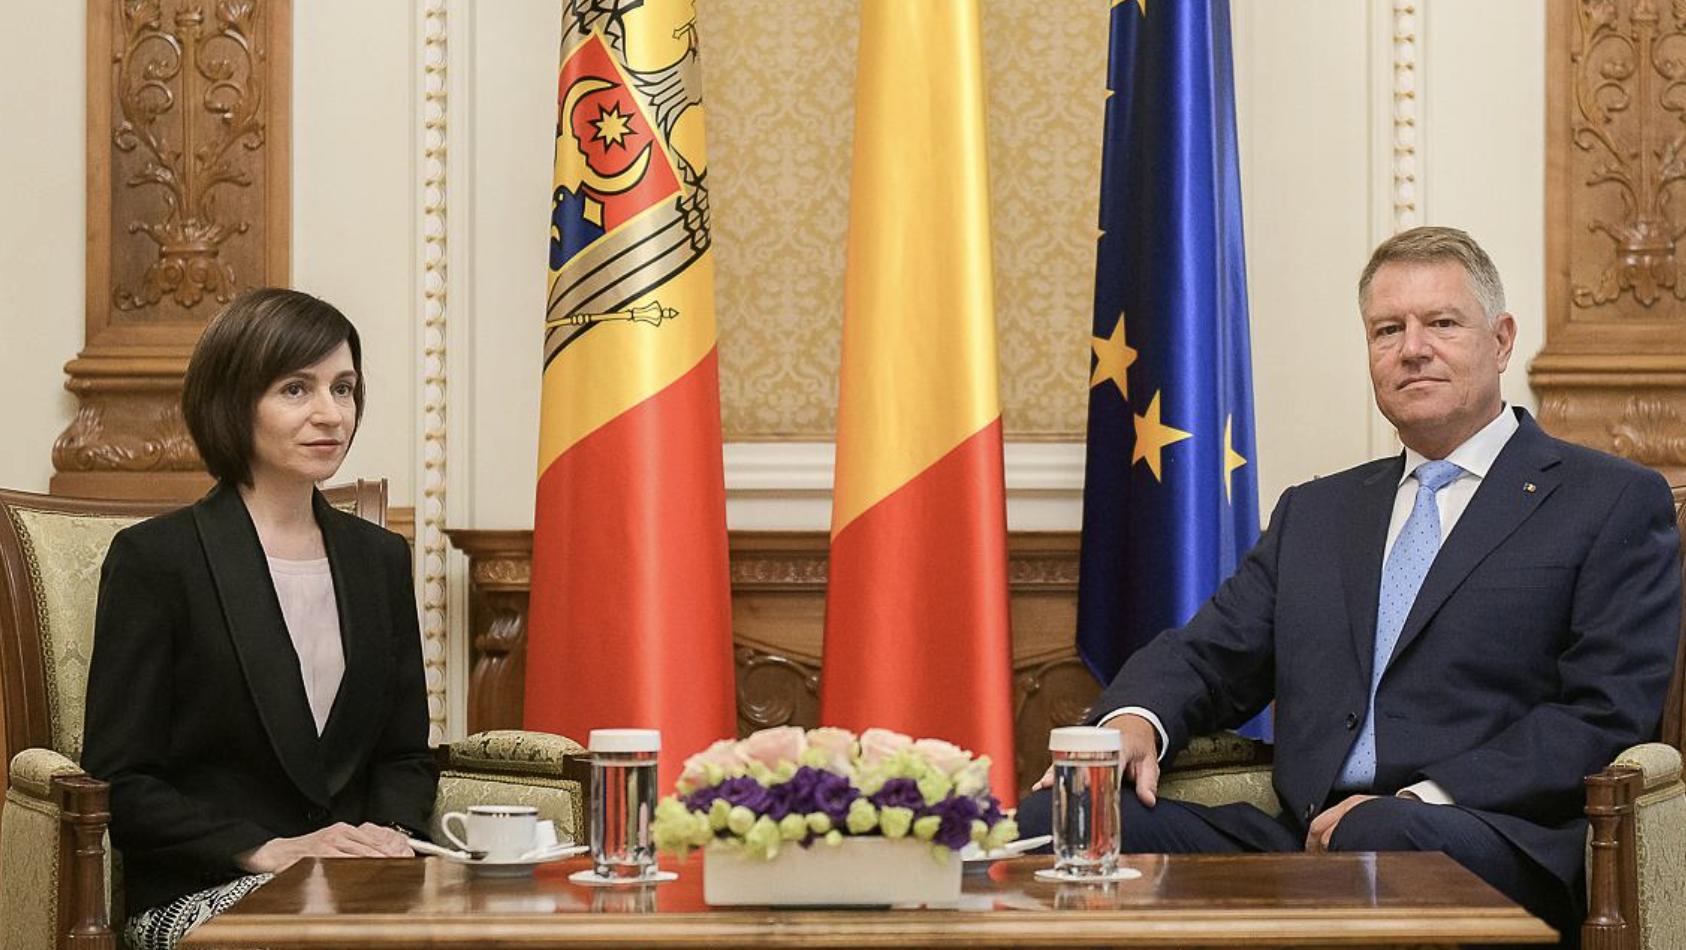 Romania remains Moldova's main partner, says Iohannis during meeting with President Sandu